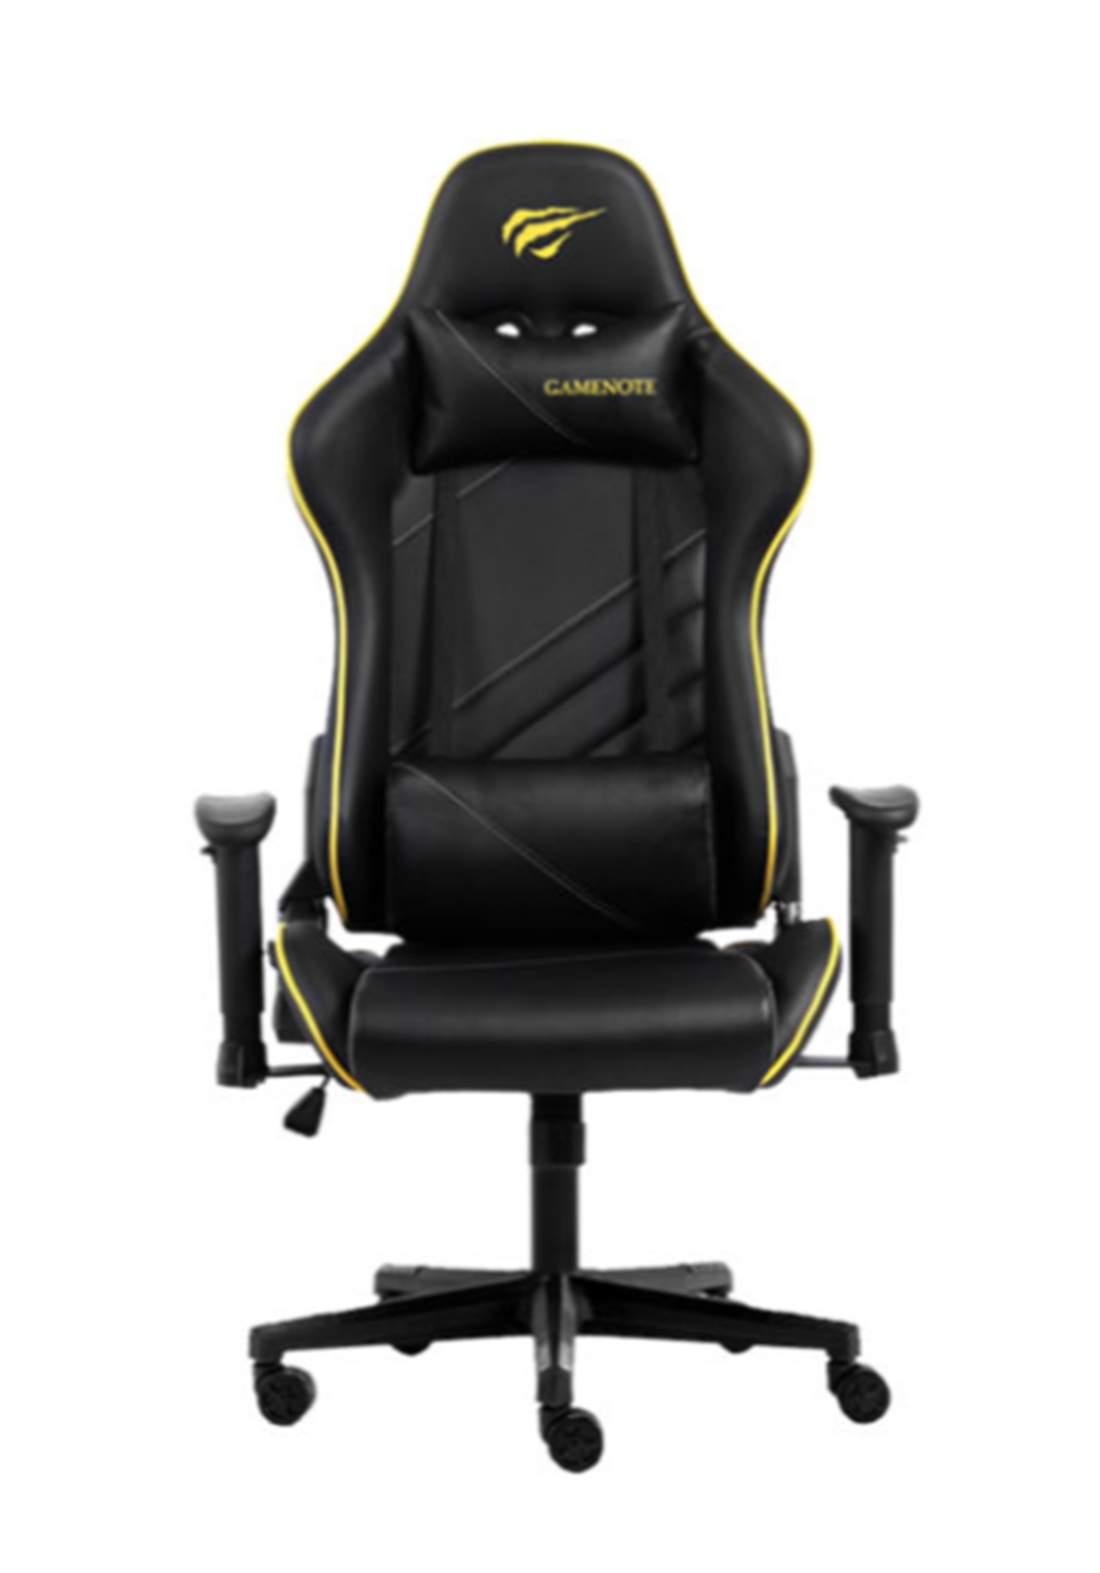 HAVIT GC930 Gaming chair - Black كرسي الالعاب